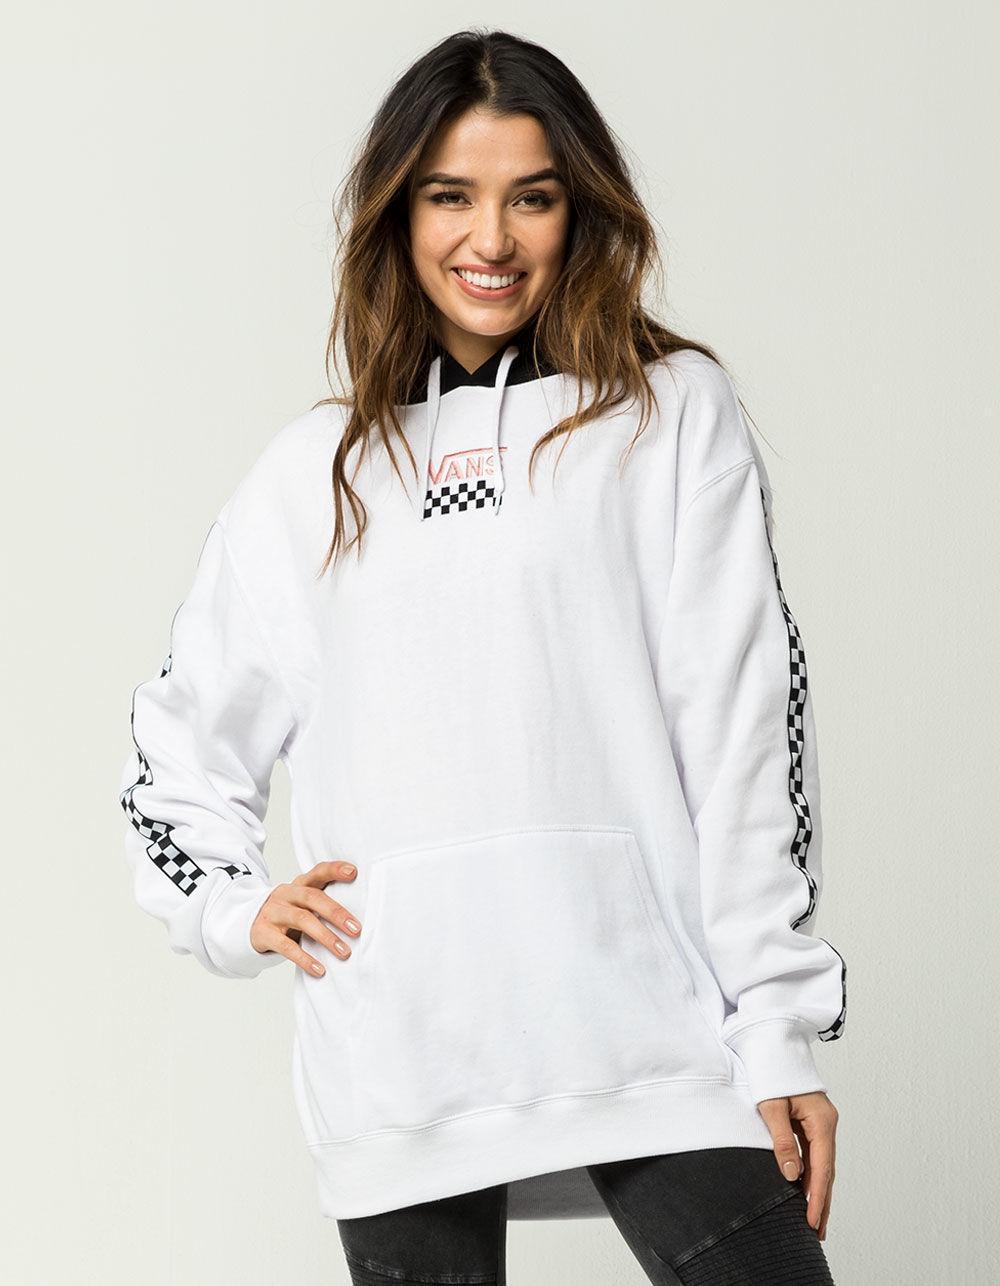 Lyst - Vans Checker Womens Hoodie in White 6e71eaf22b